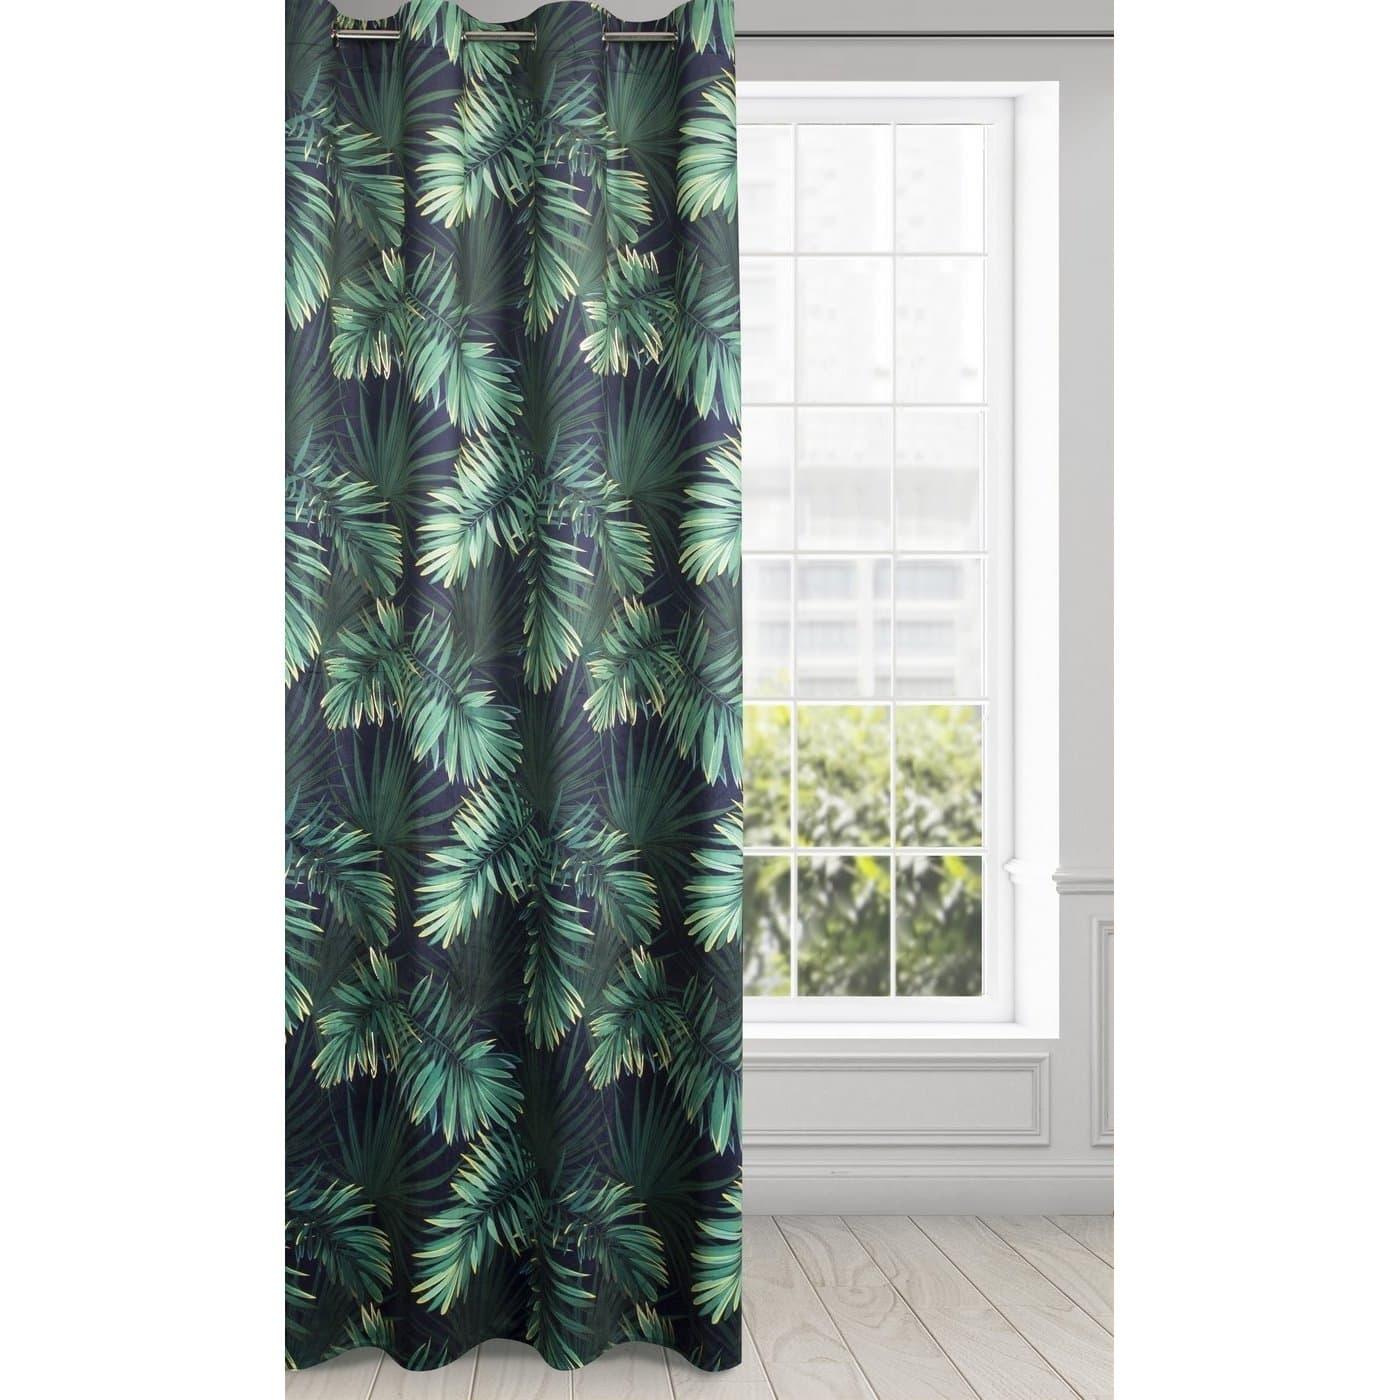 Draperie Omega Velvet Negru / Verde, 140 x 250 cm, 1 bucata poza